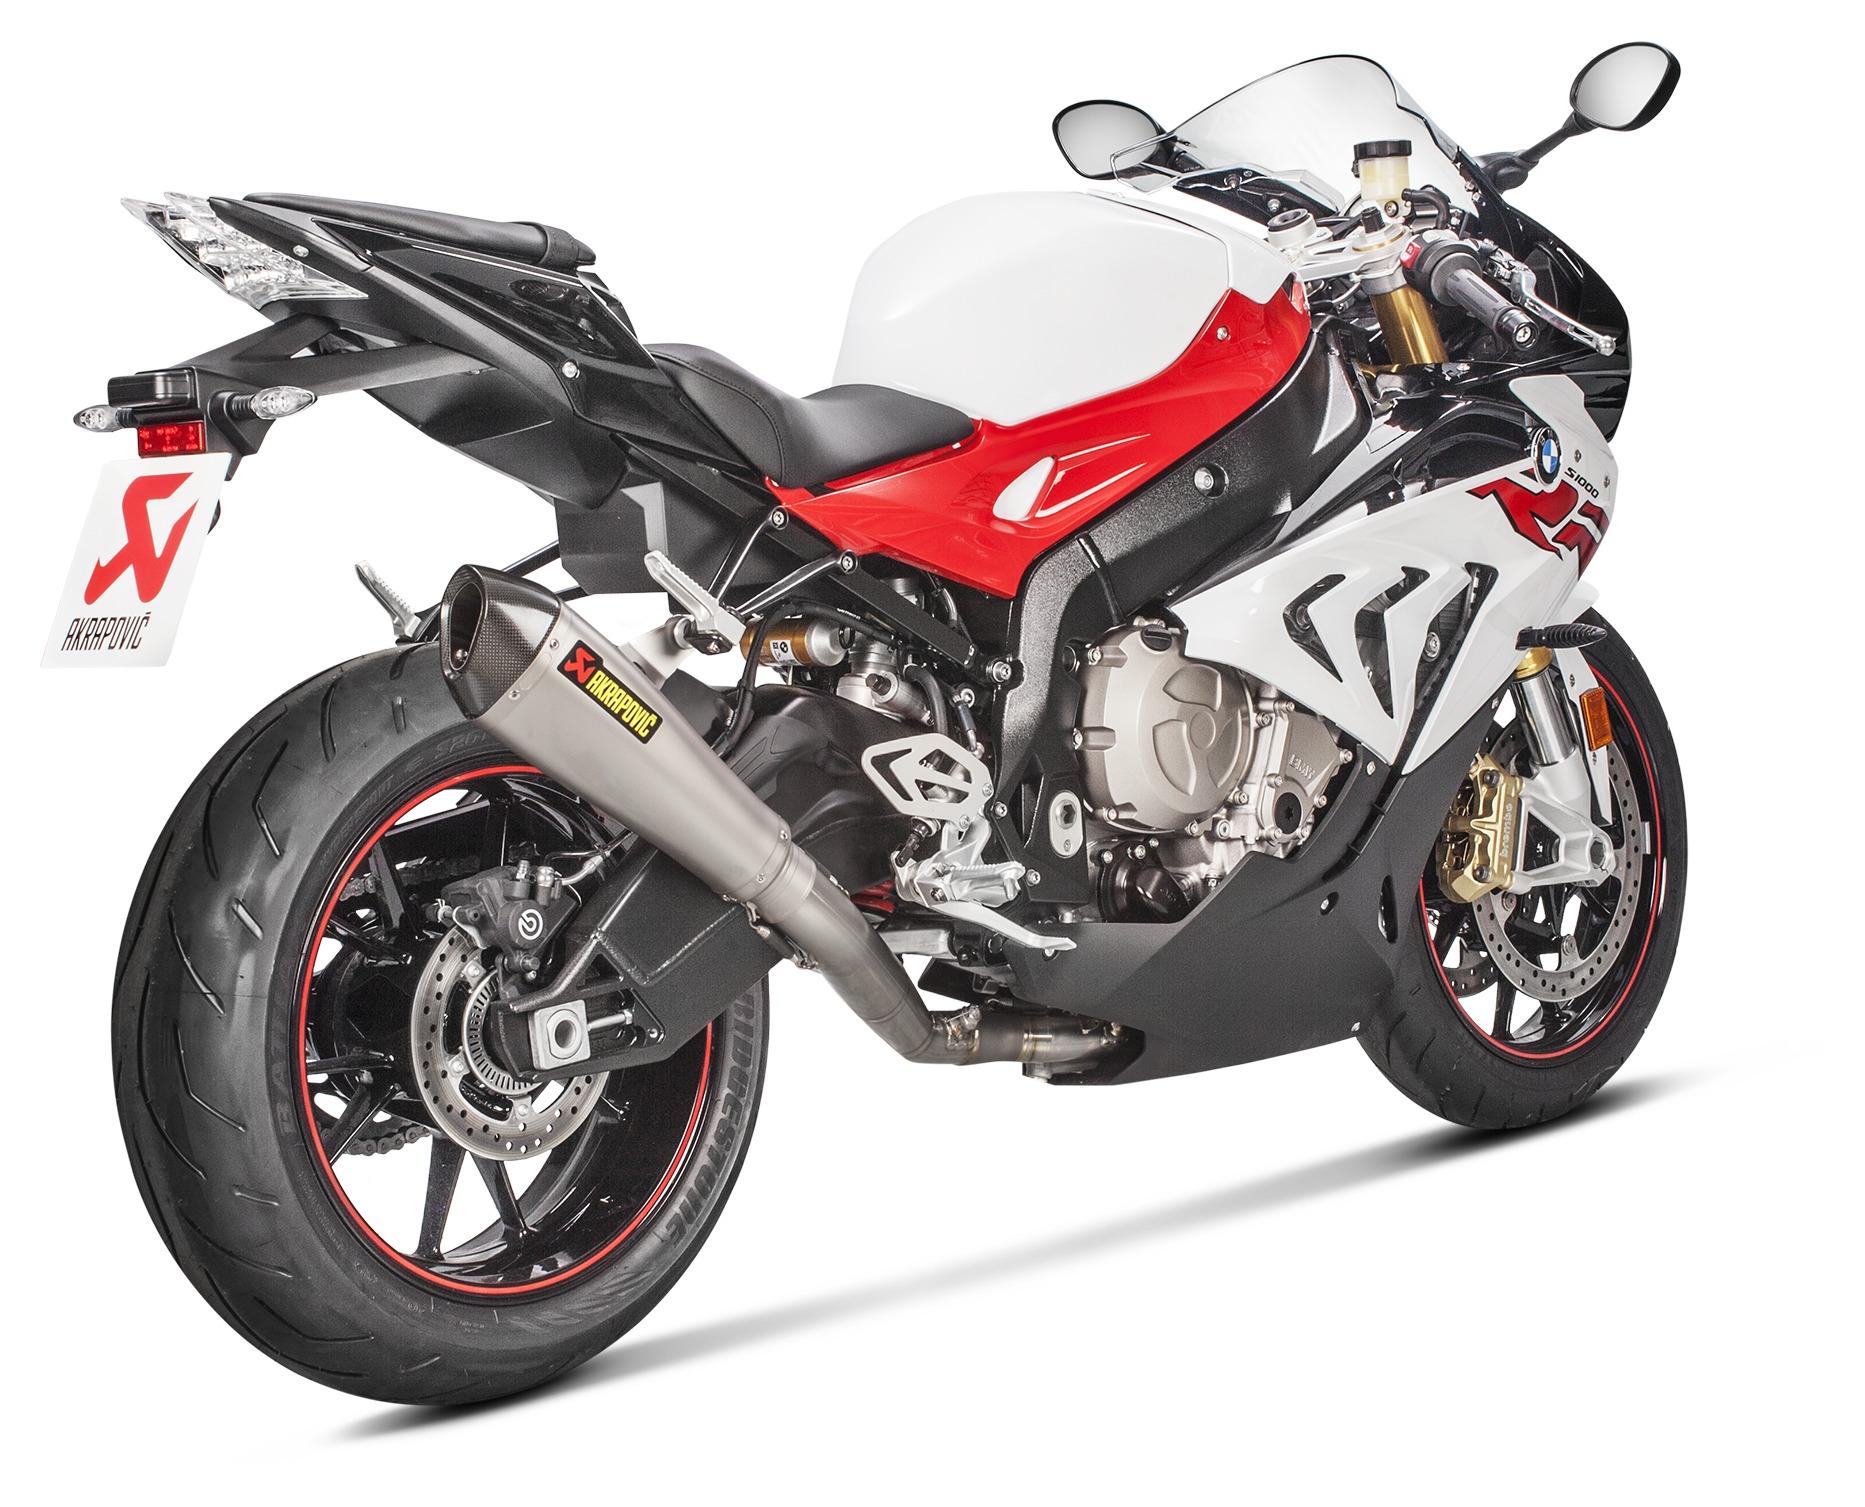 Akrapovic Racing Exhaust System Bmw S1000rr 2015 2019 10 174 59